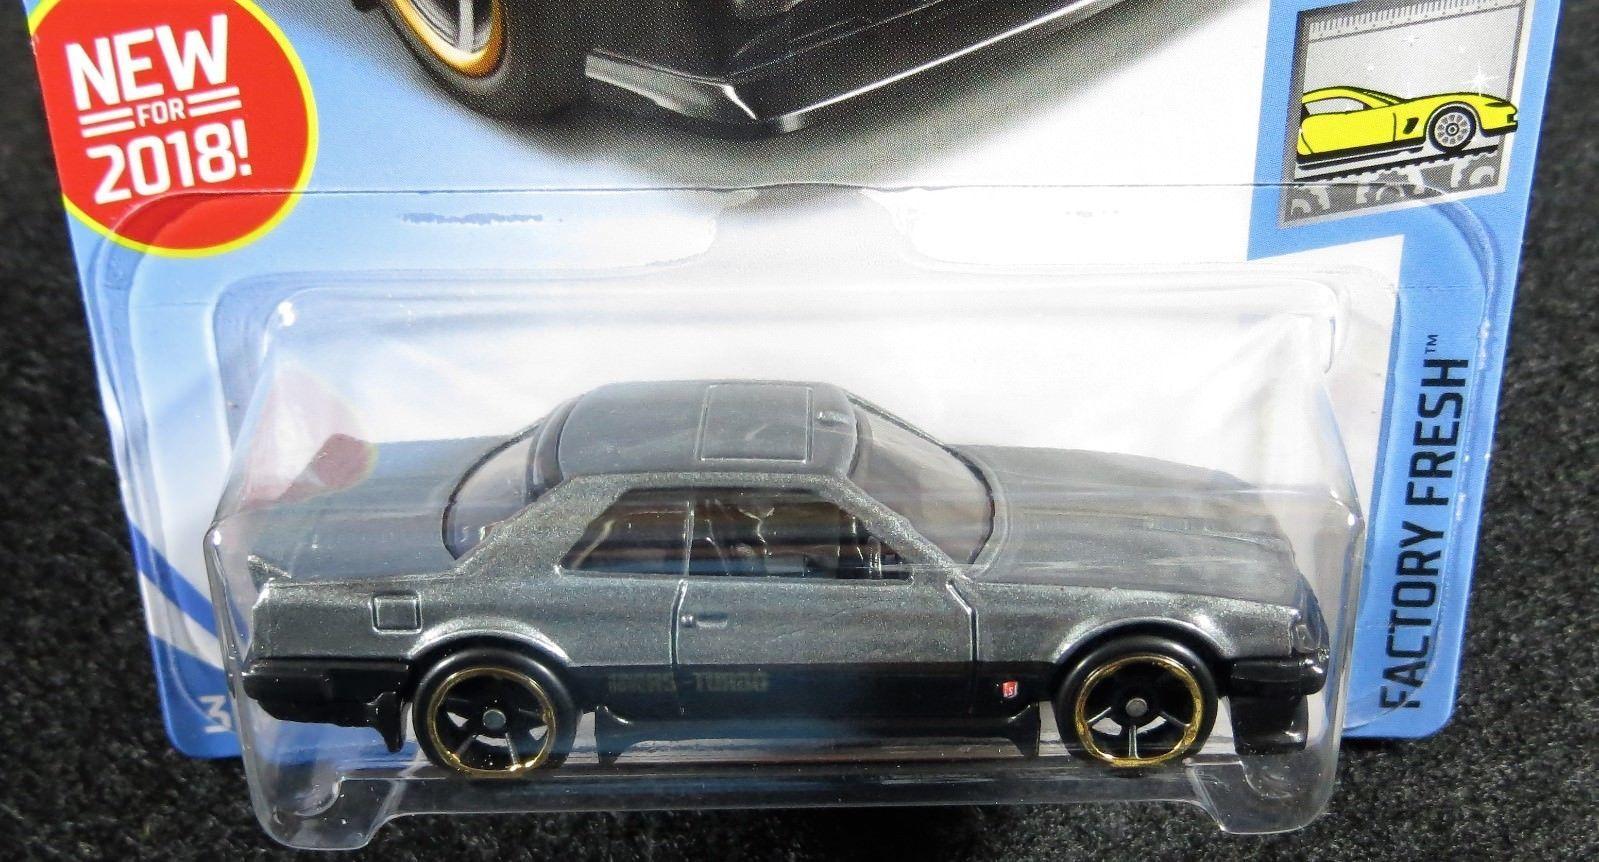 2018 Hot Wheels Gray 82 Nissan Skyline R30 And 50 Similar Items Hotwheels Silver Card 169